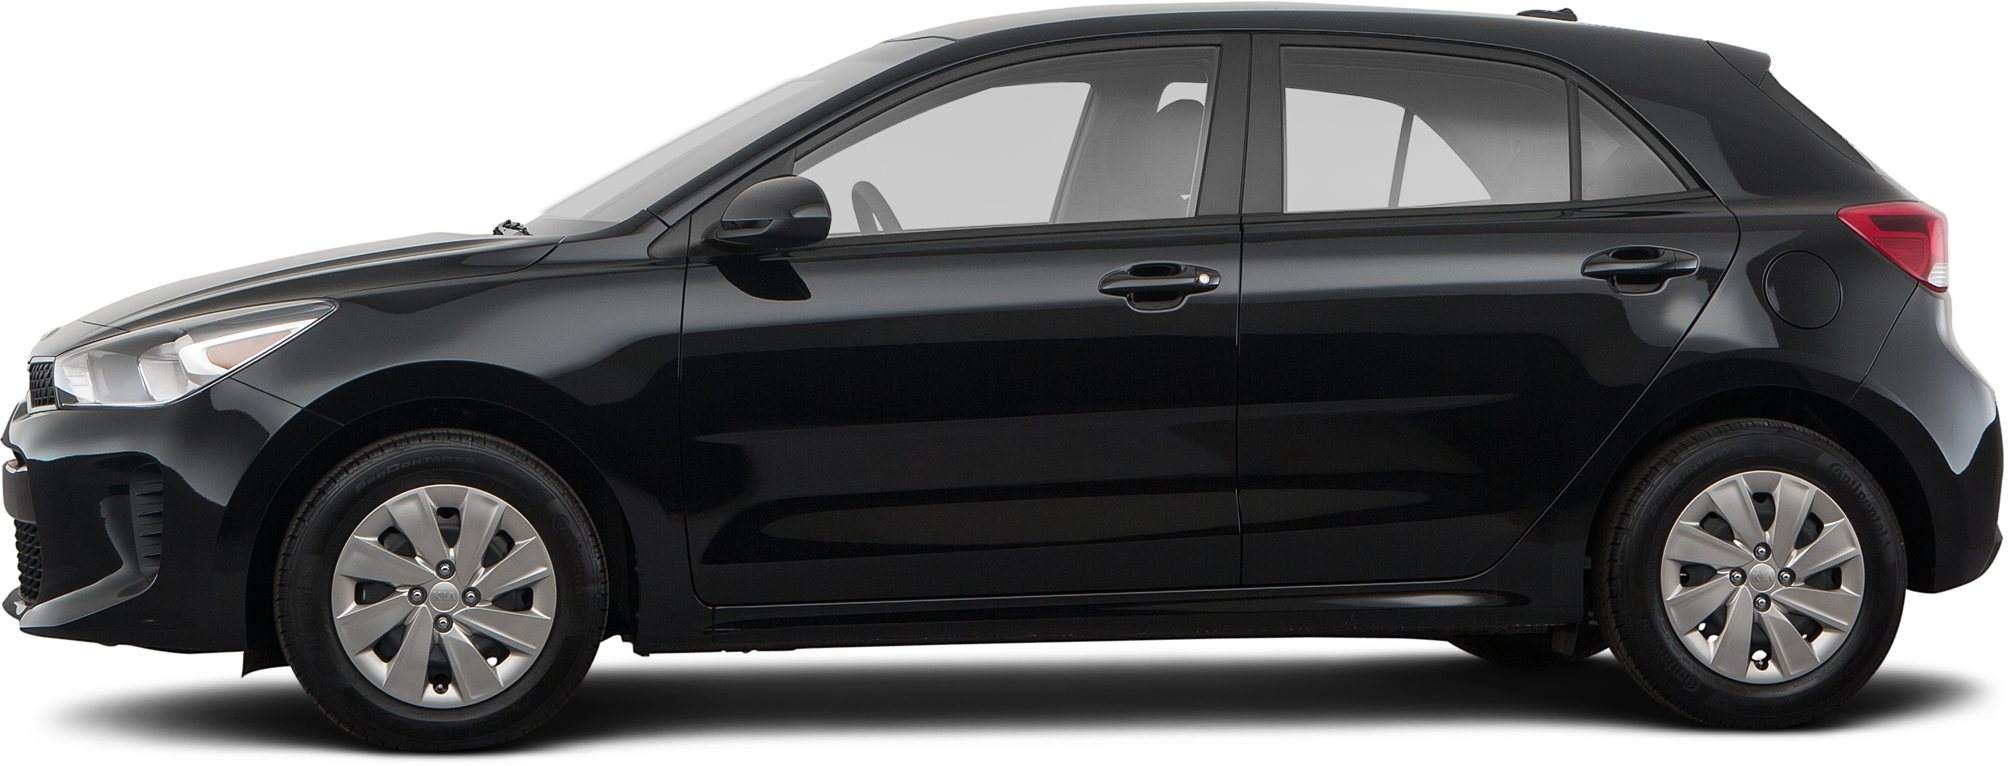 2018 Kia Rio Hatchback S